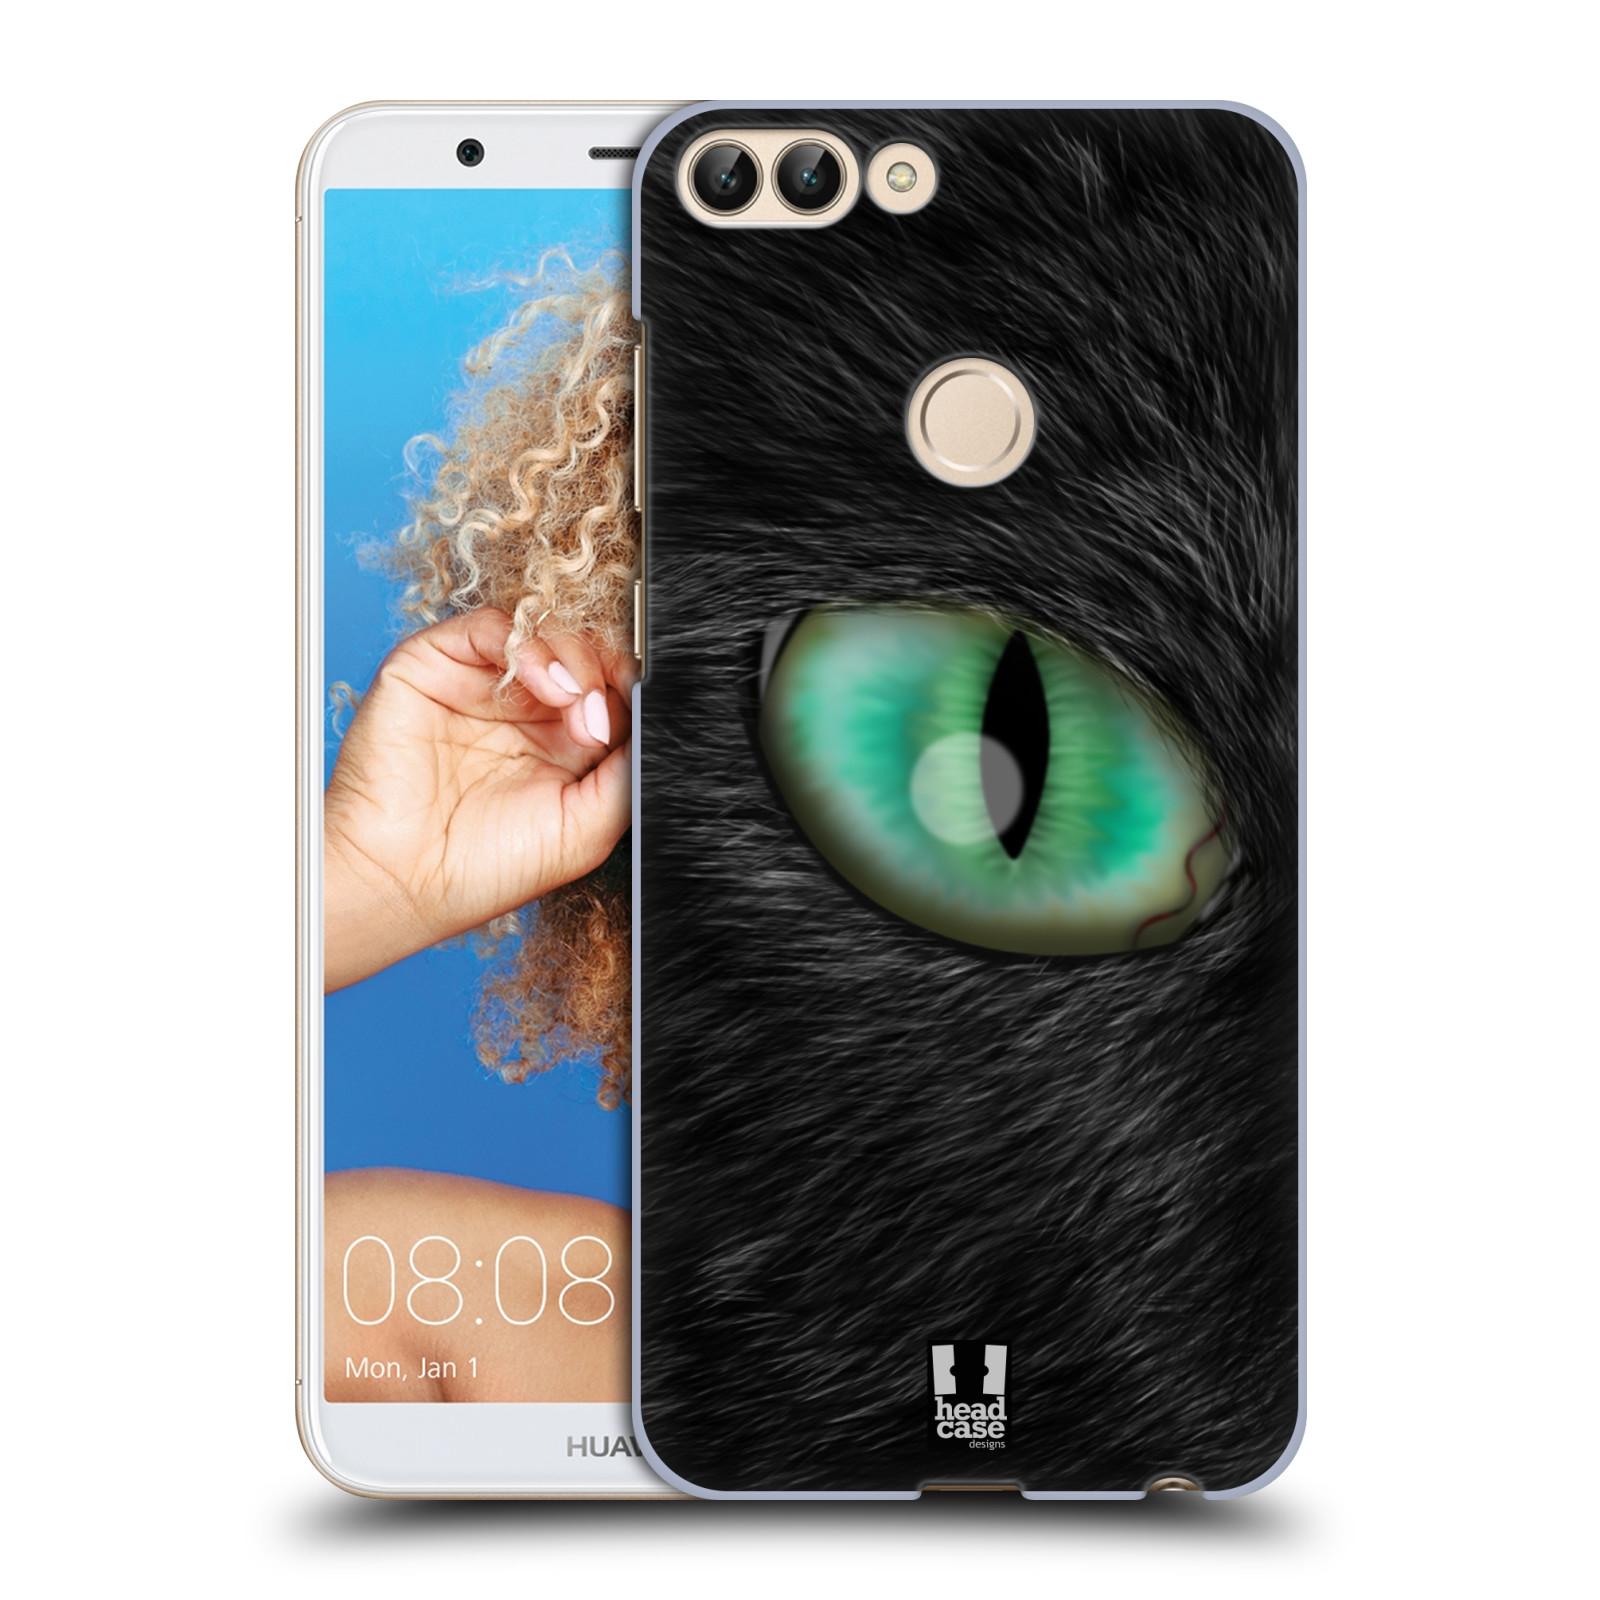 HEAD CASE plastový obal na mobil Huawei P Smart vzor pohled zvířete oko kočka